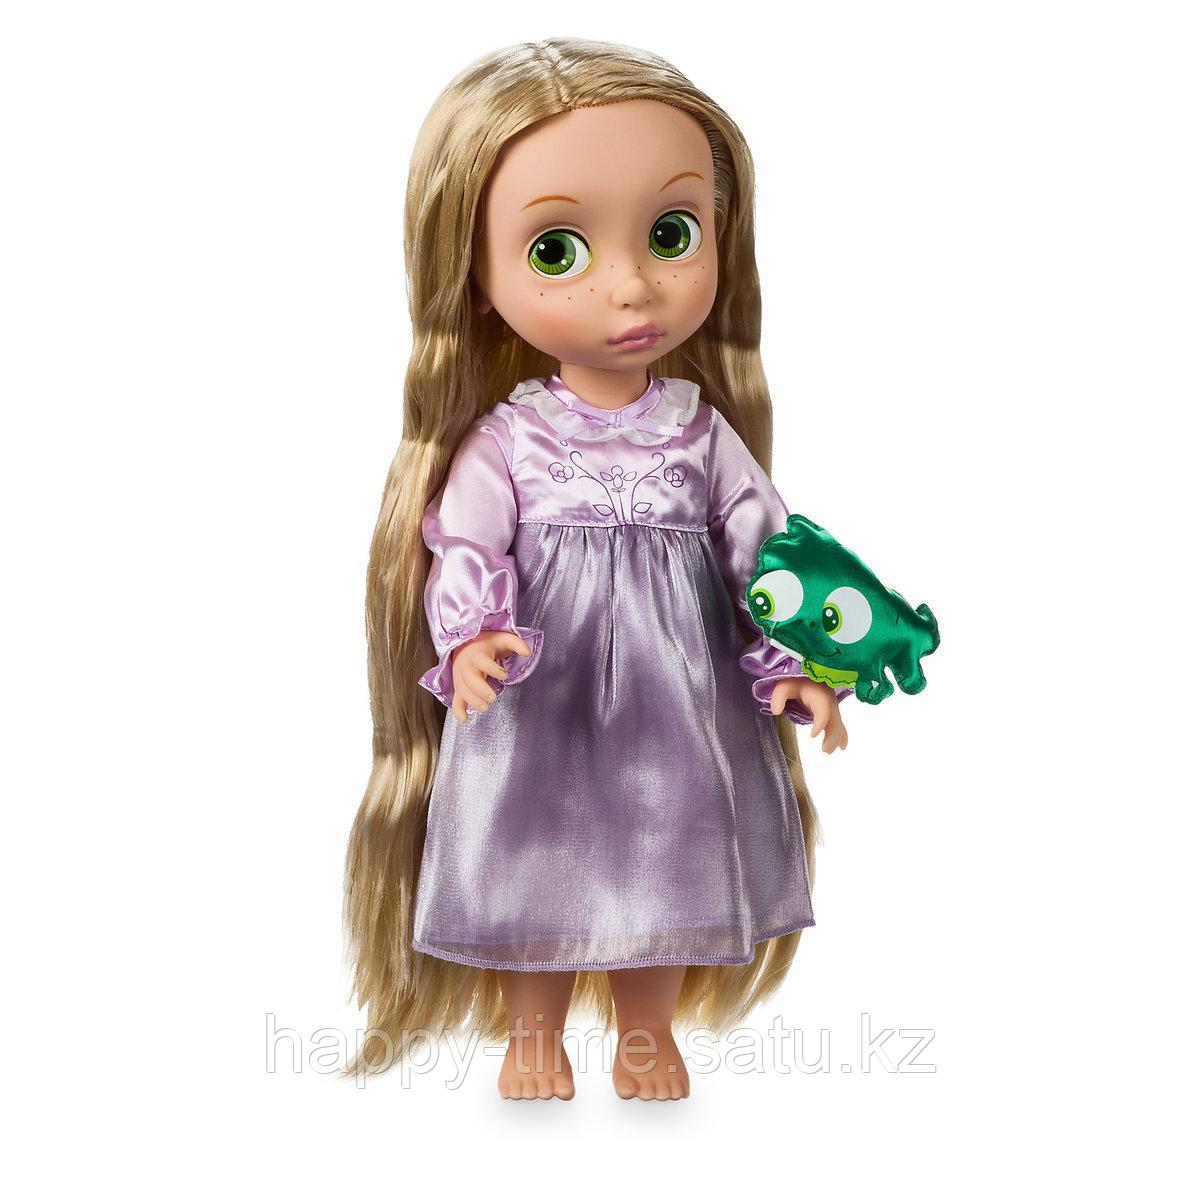 Кукла Рапунцель из коллекции Disney Animators'